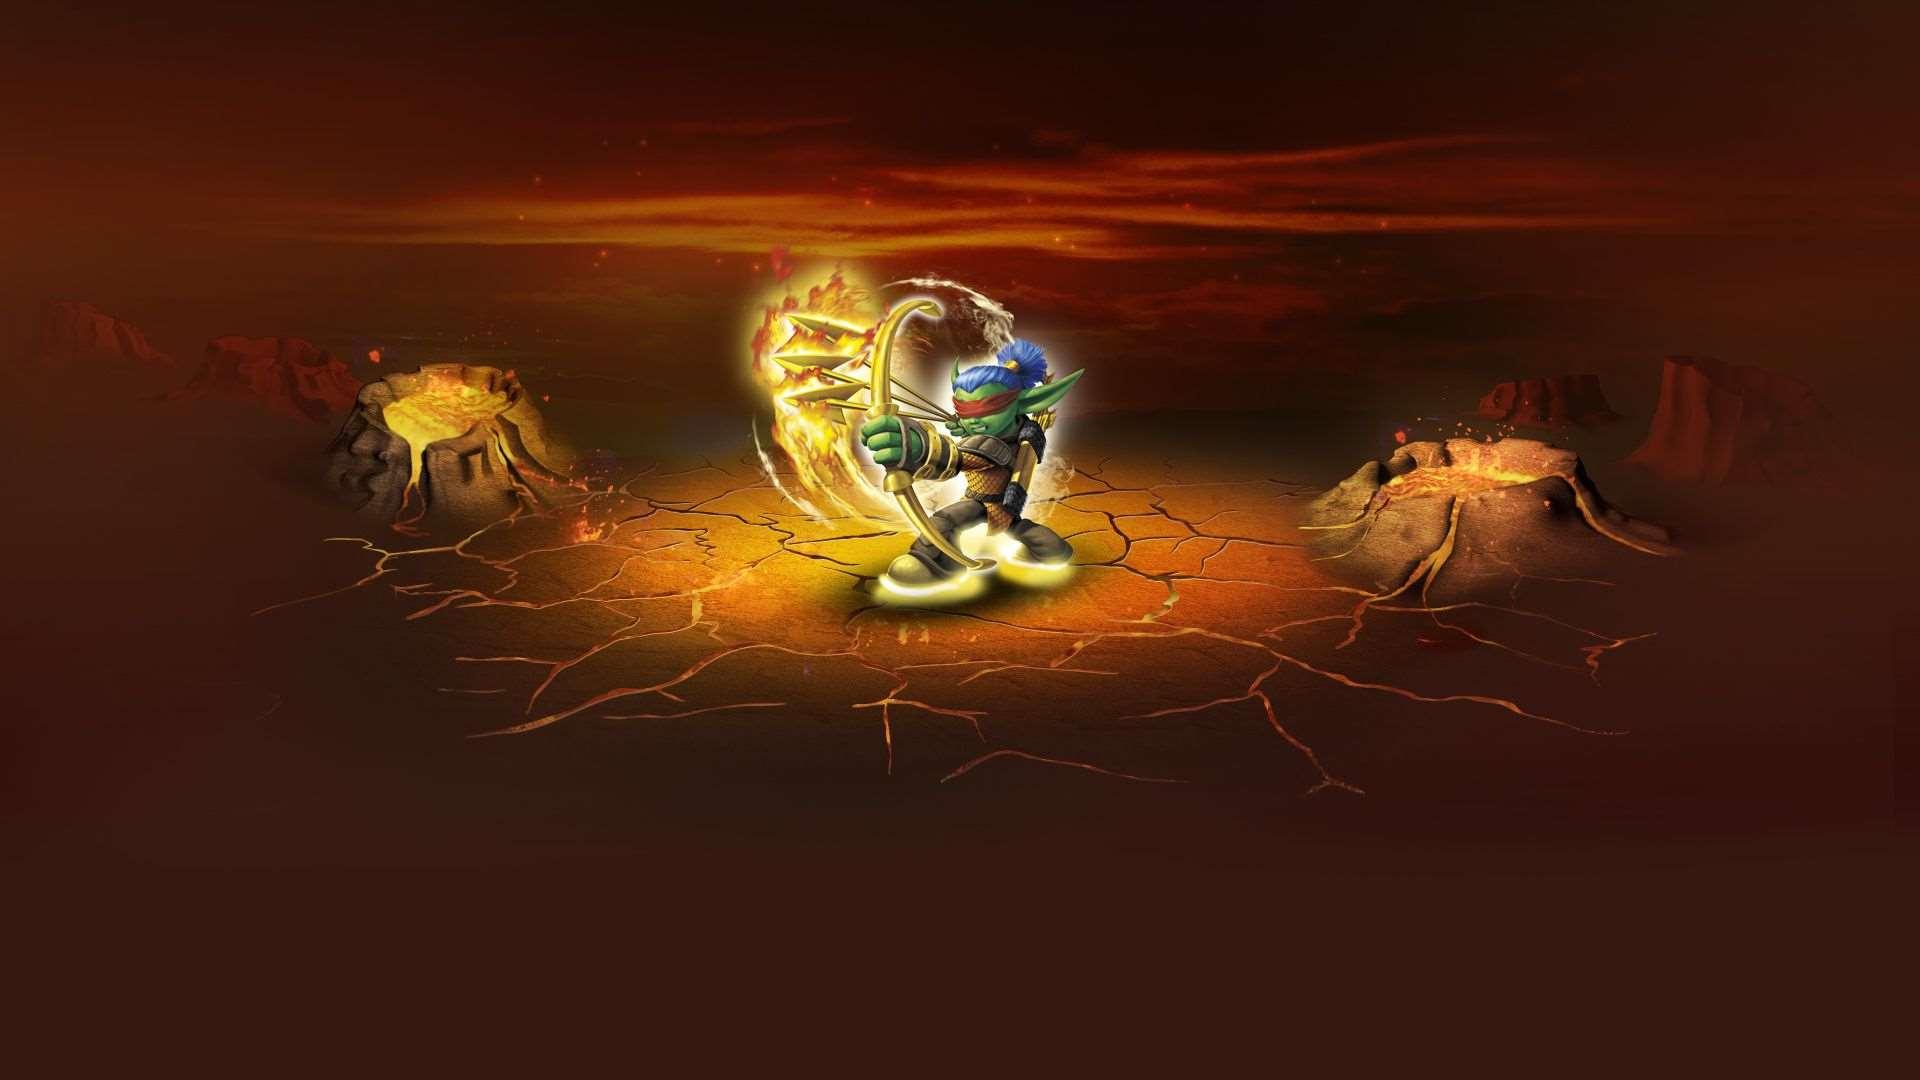 Skylanders Drobot Stump Smash Flameslinger   PC PS3 Xbox 360 Wii 1920x1080